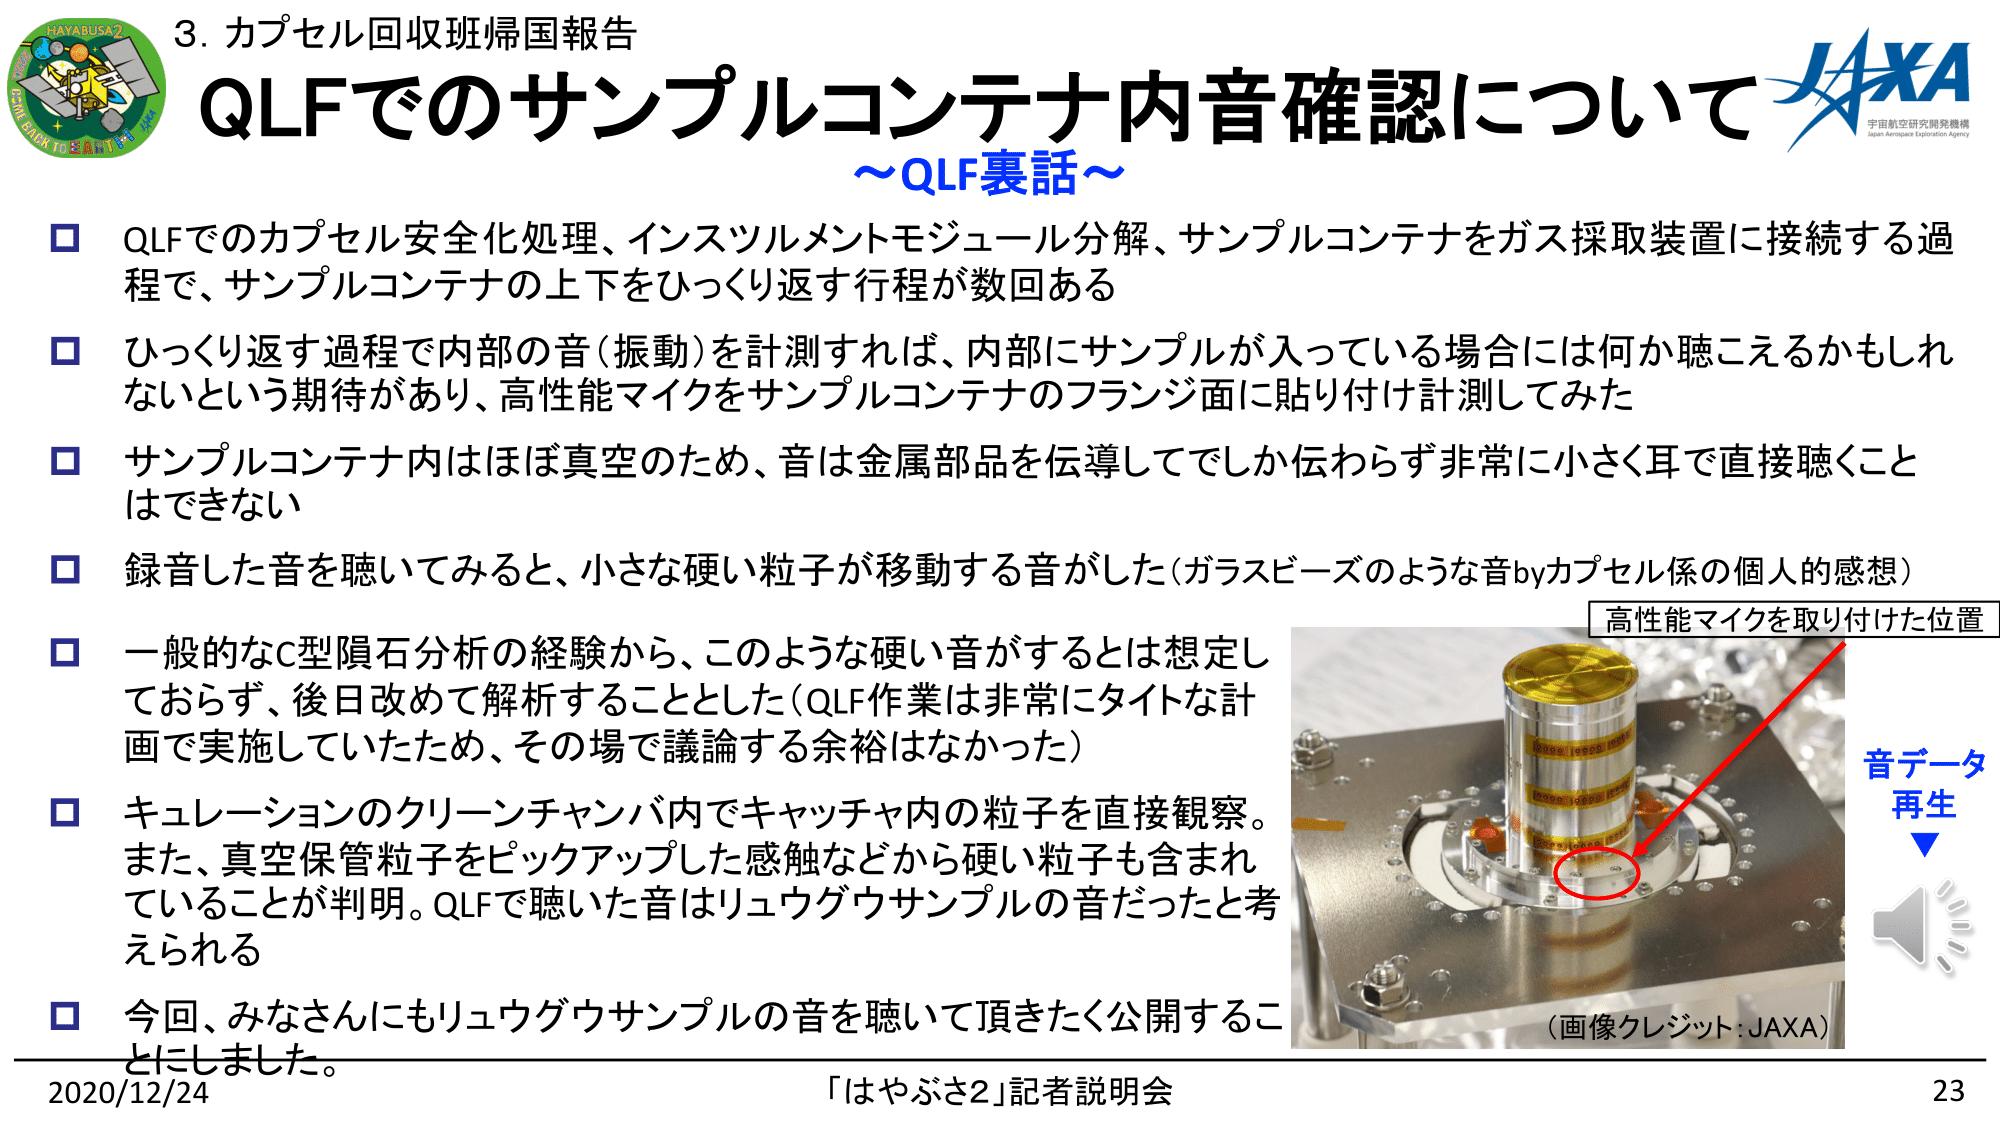 f:id:Imamura:20201224135230p:plain